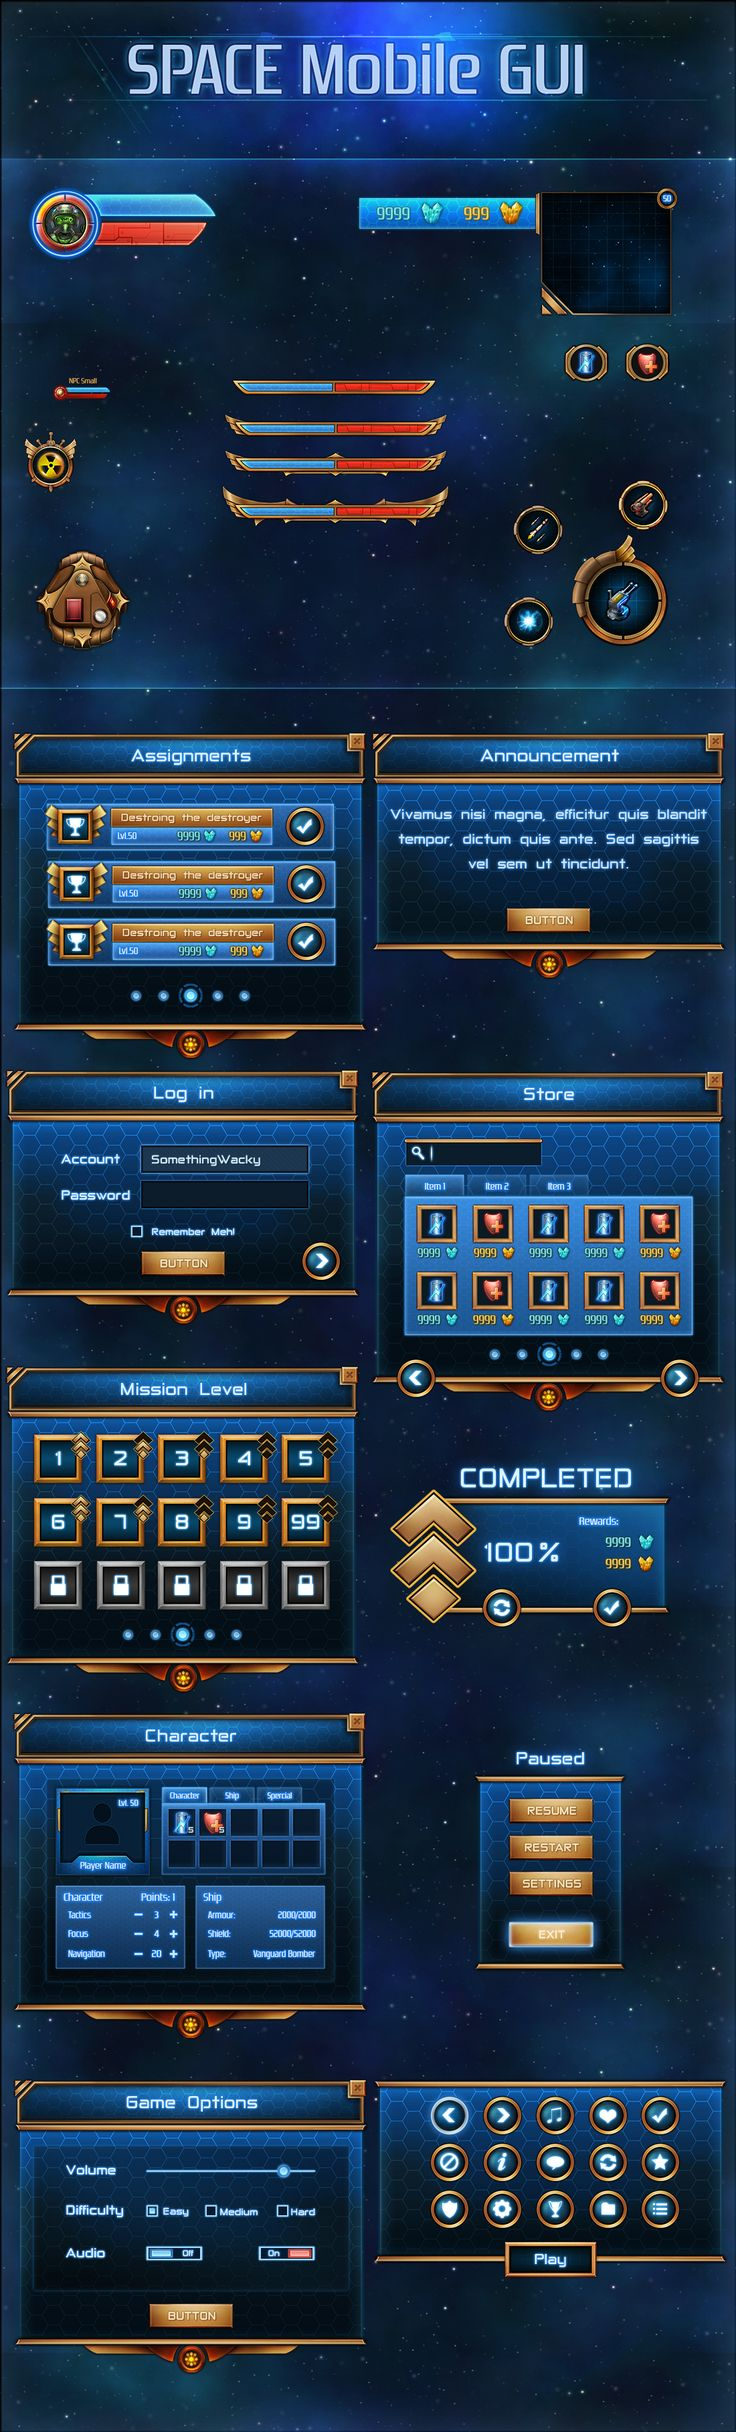 Space Mobile GUI by VengeanceMK1.deviantart.com on @DeviantArt